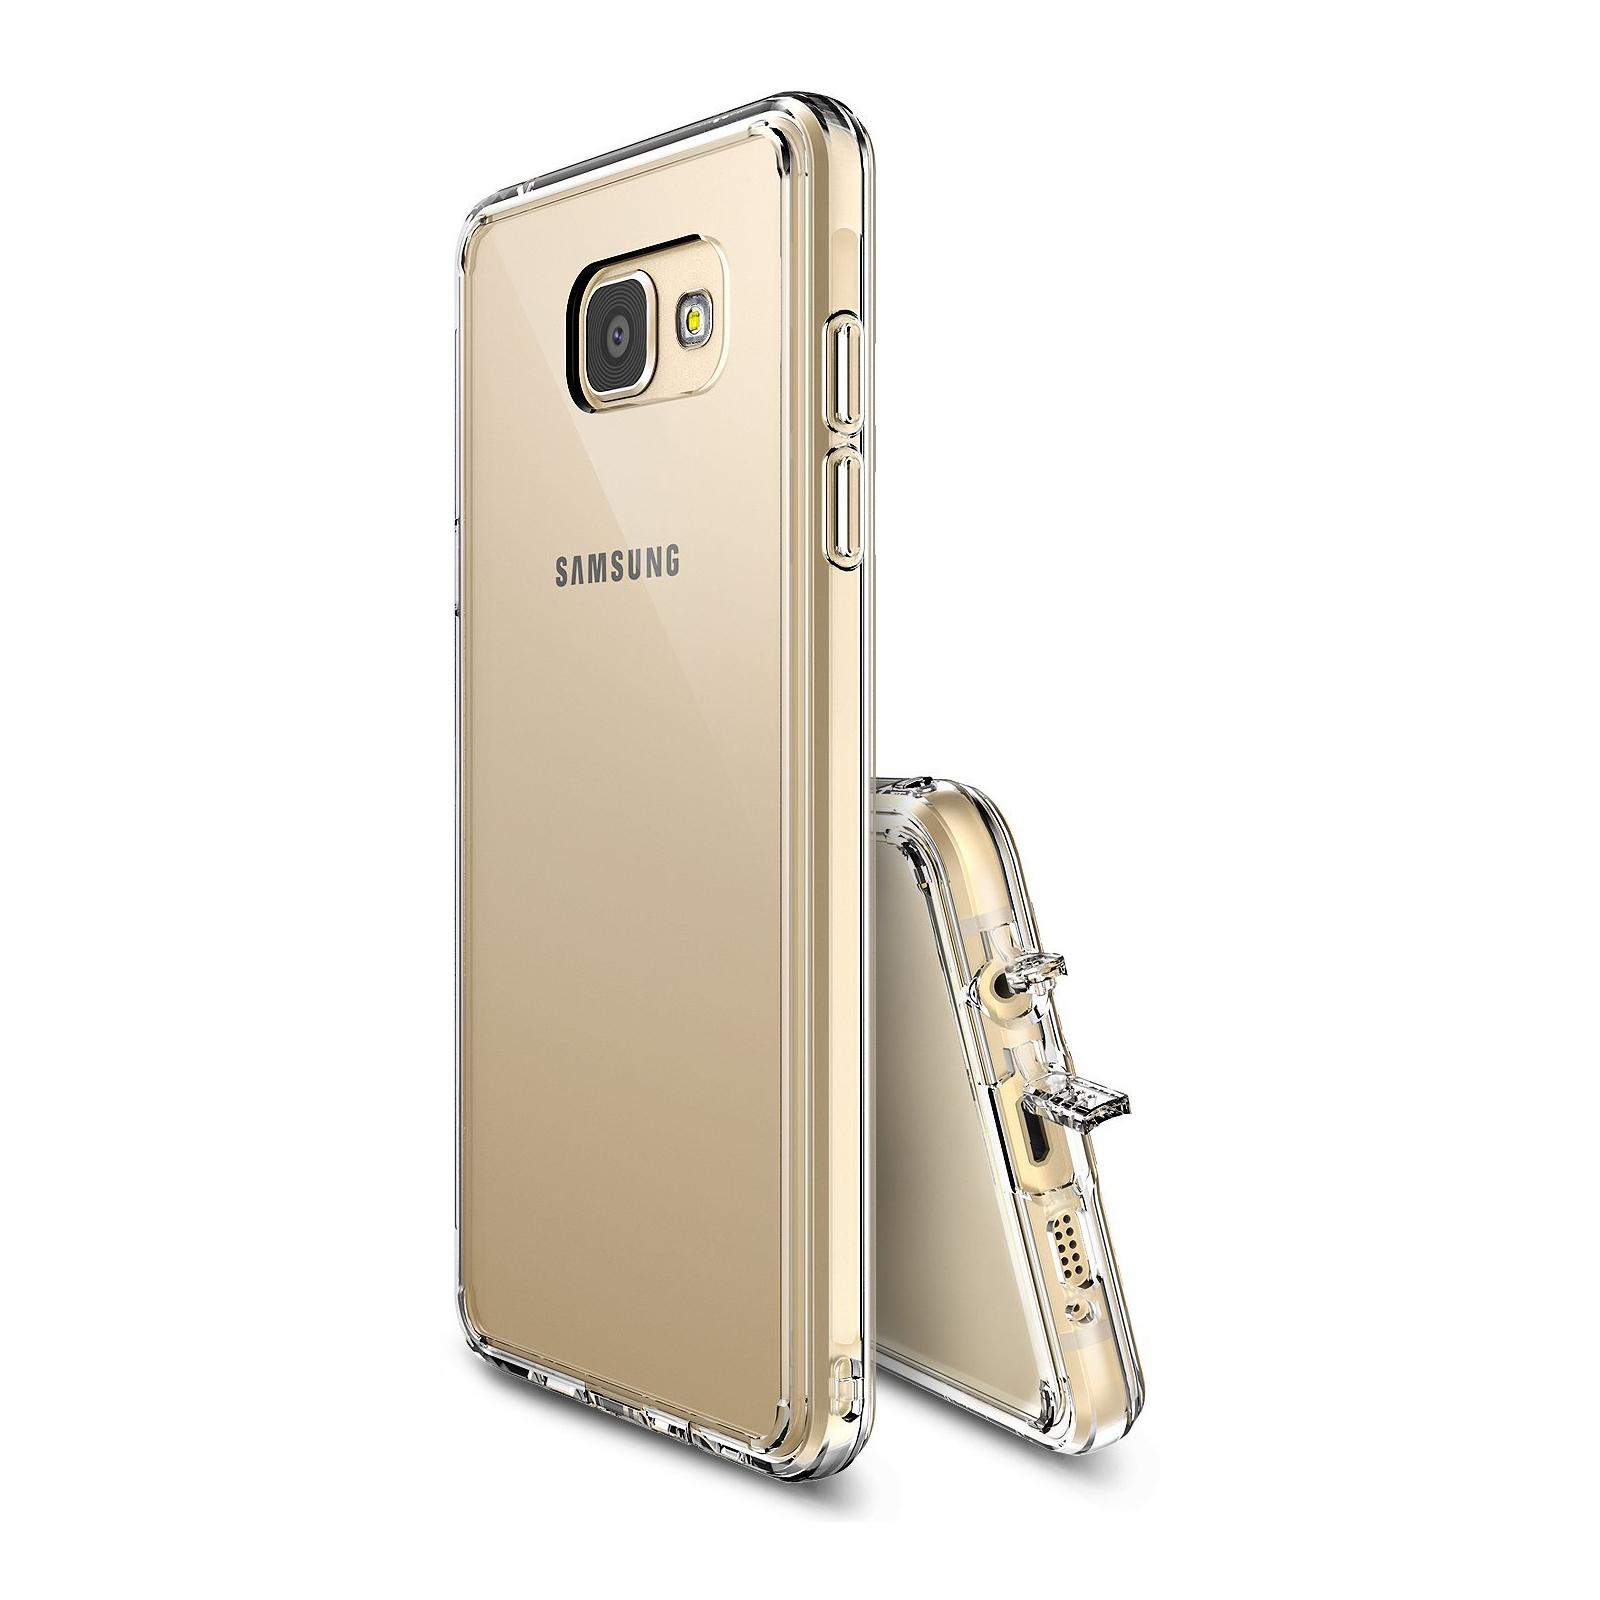 Чехол для моб. телефона Ringke Fusion для Samsung Galaxy A7 2016 Crystal View (179997) изображение 2